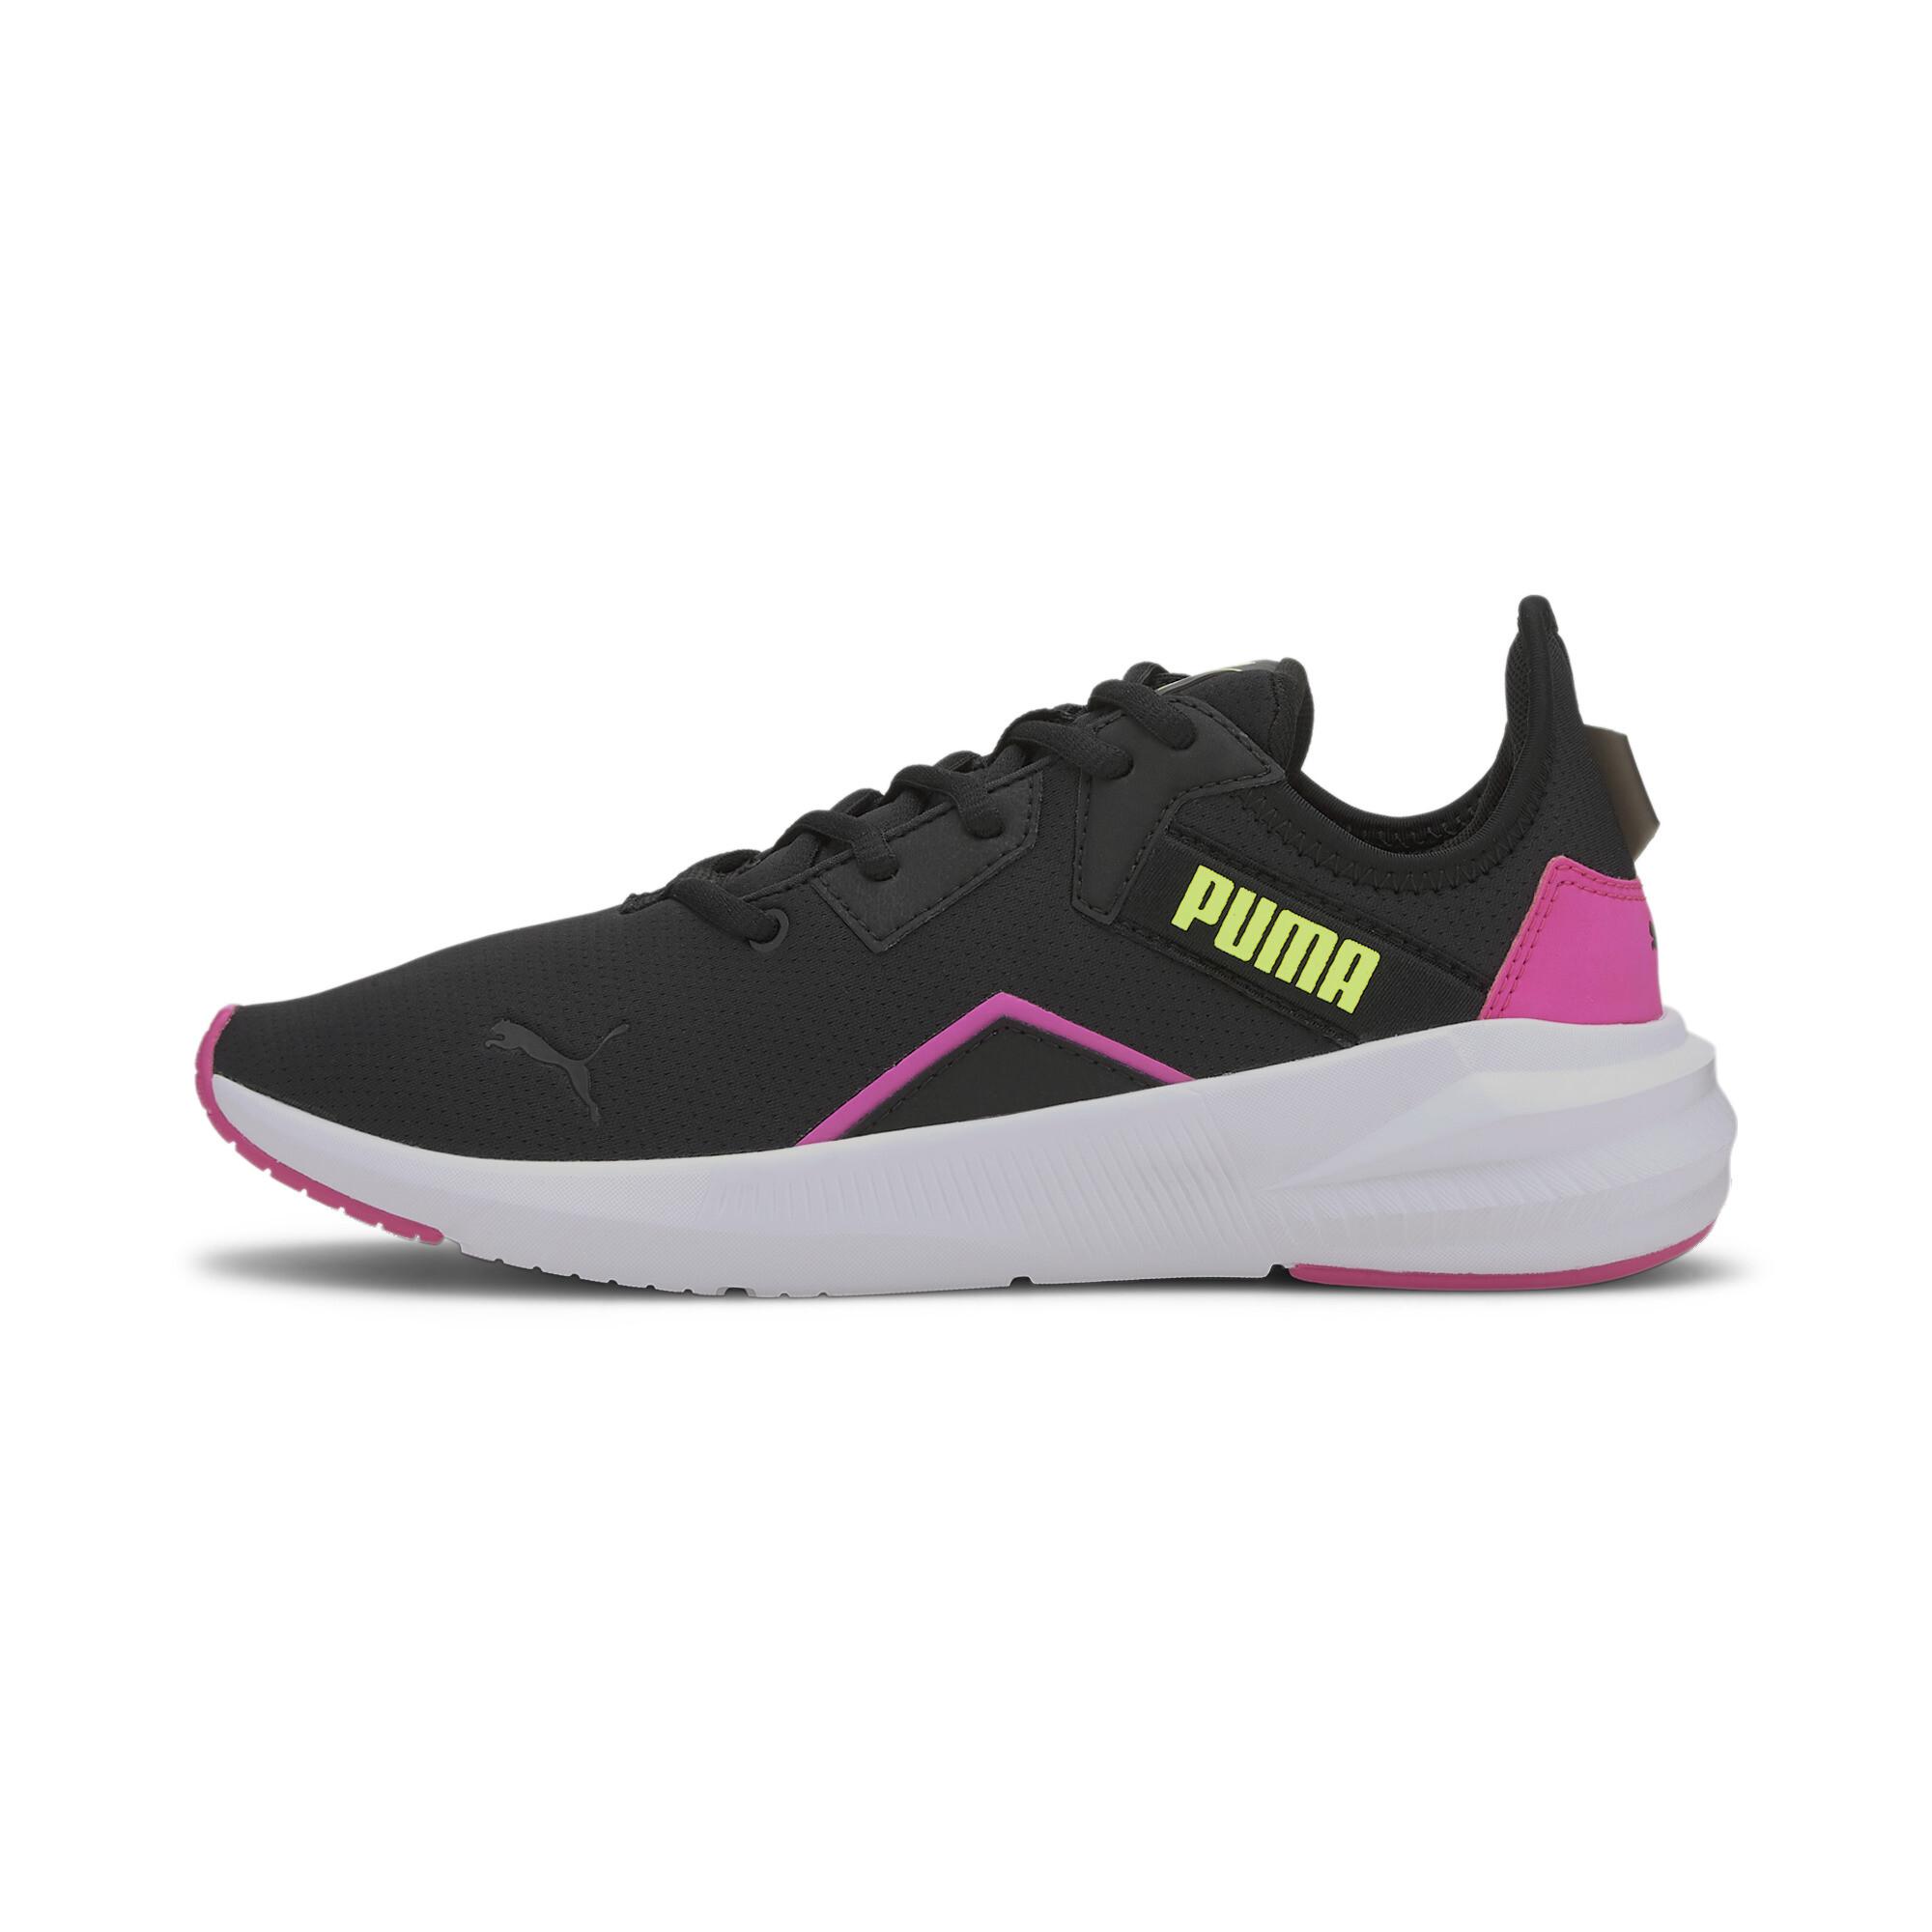 thumbnail 4 - PUMA-Women-039-s-Platinum-Training-Shoes